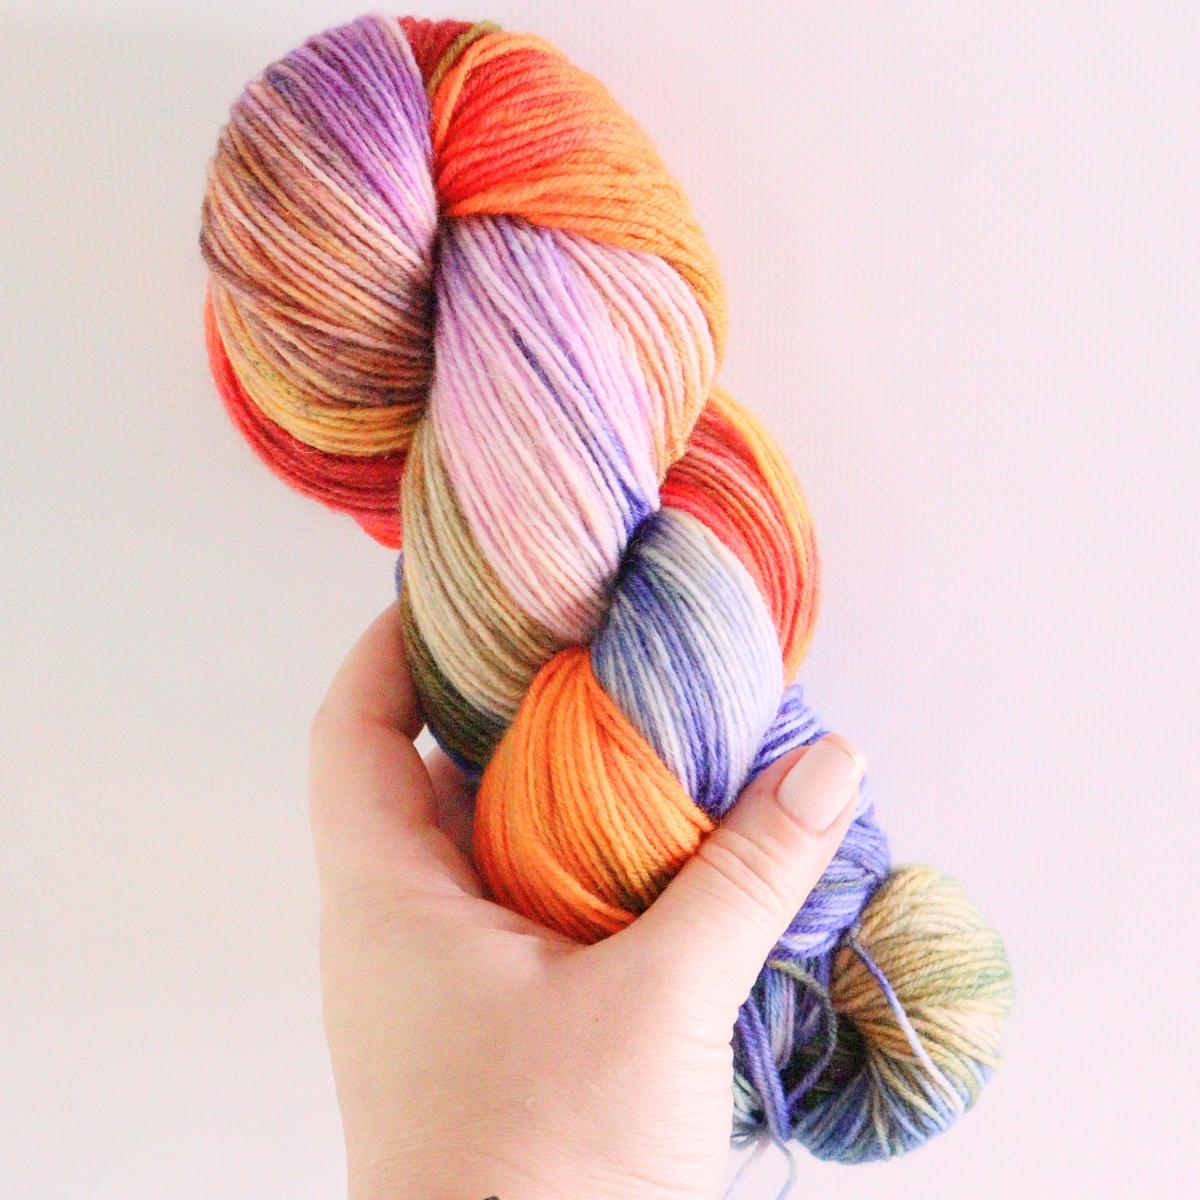 woodico.pro hand dyed yarn 078 7 1200x1200 - Hand dyed yarn / 078